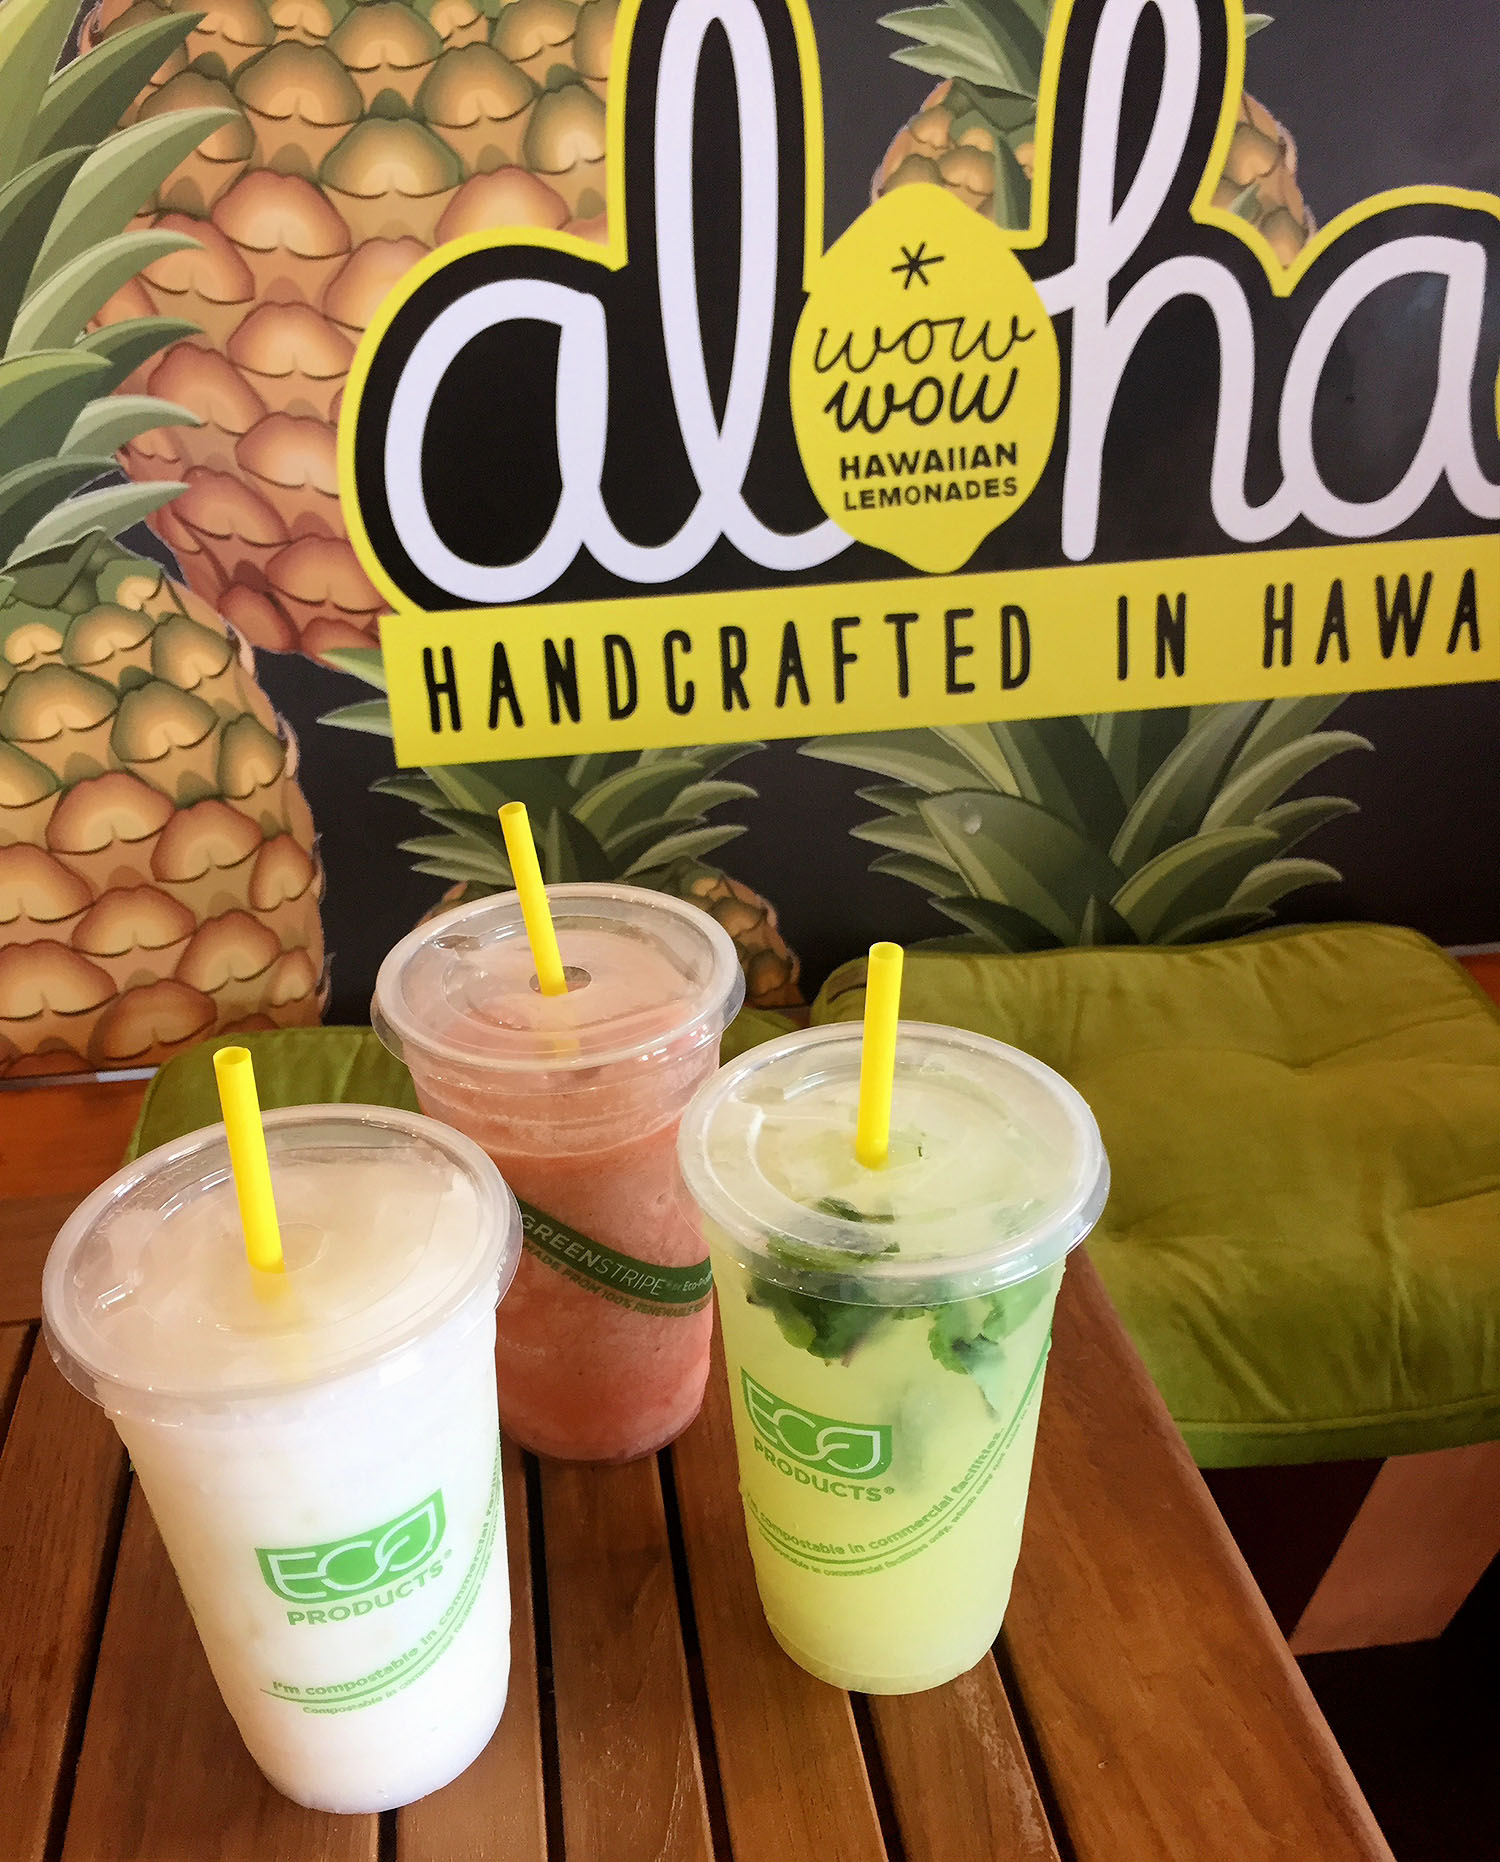 Alohawow2.jpg